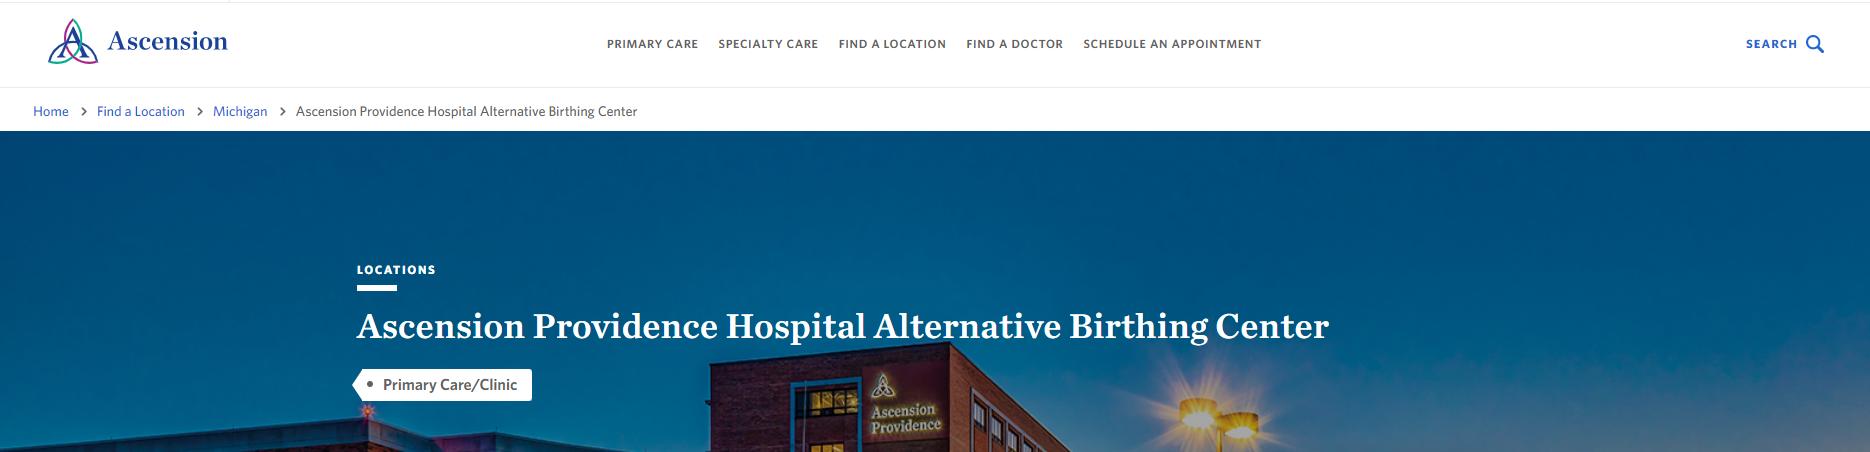 Ascension Providence Hospital Alternative Birthing Center